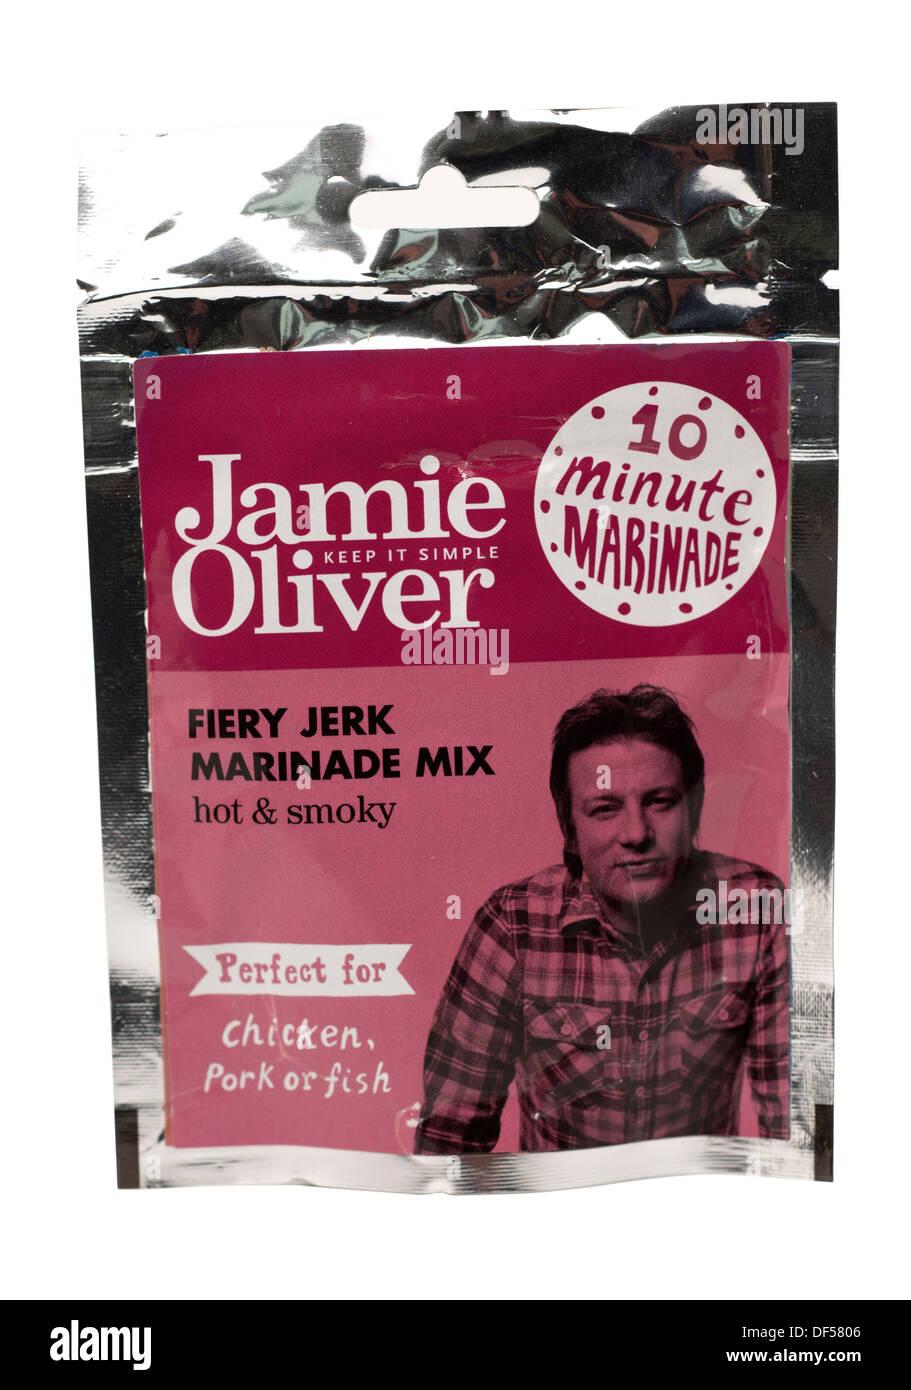 Sachet of Jamie Oliver 10 minute marinade - Stock Image